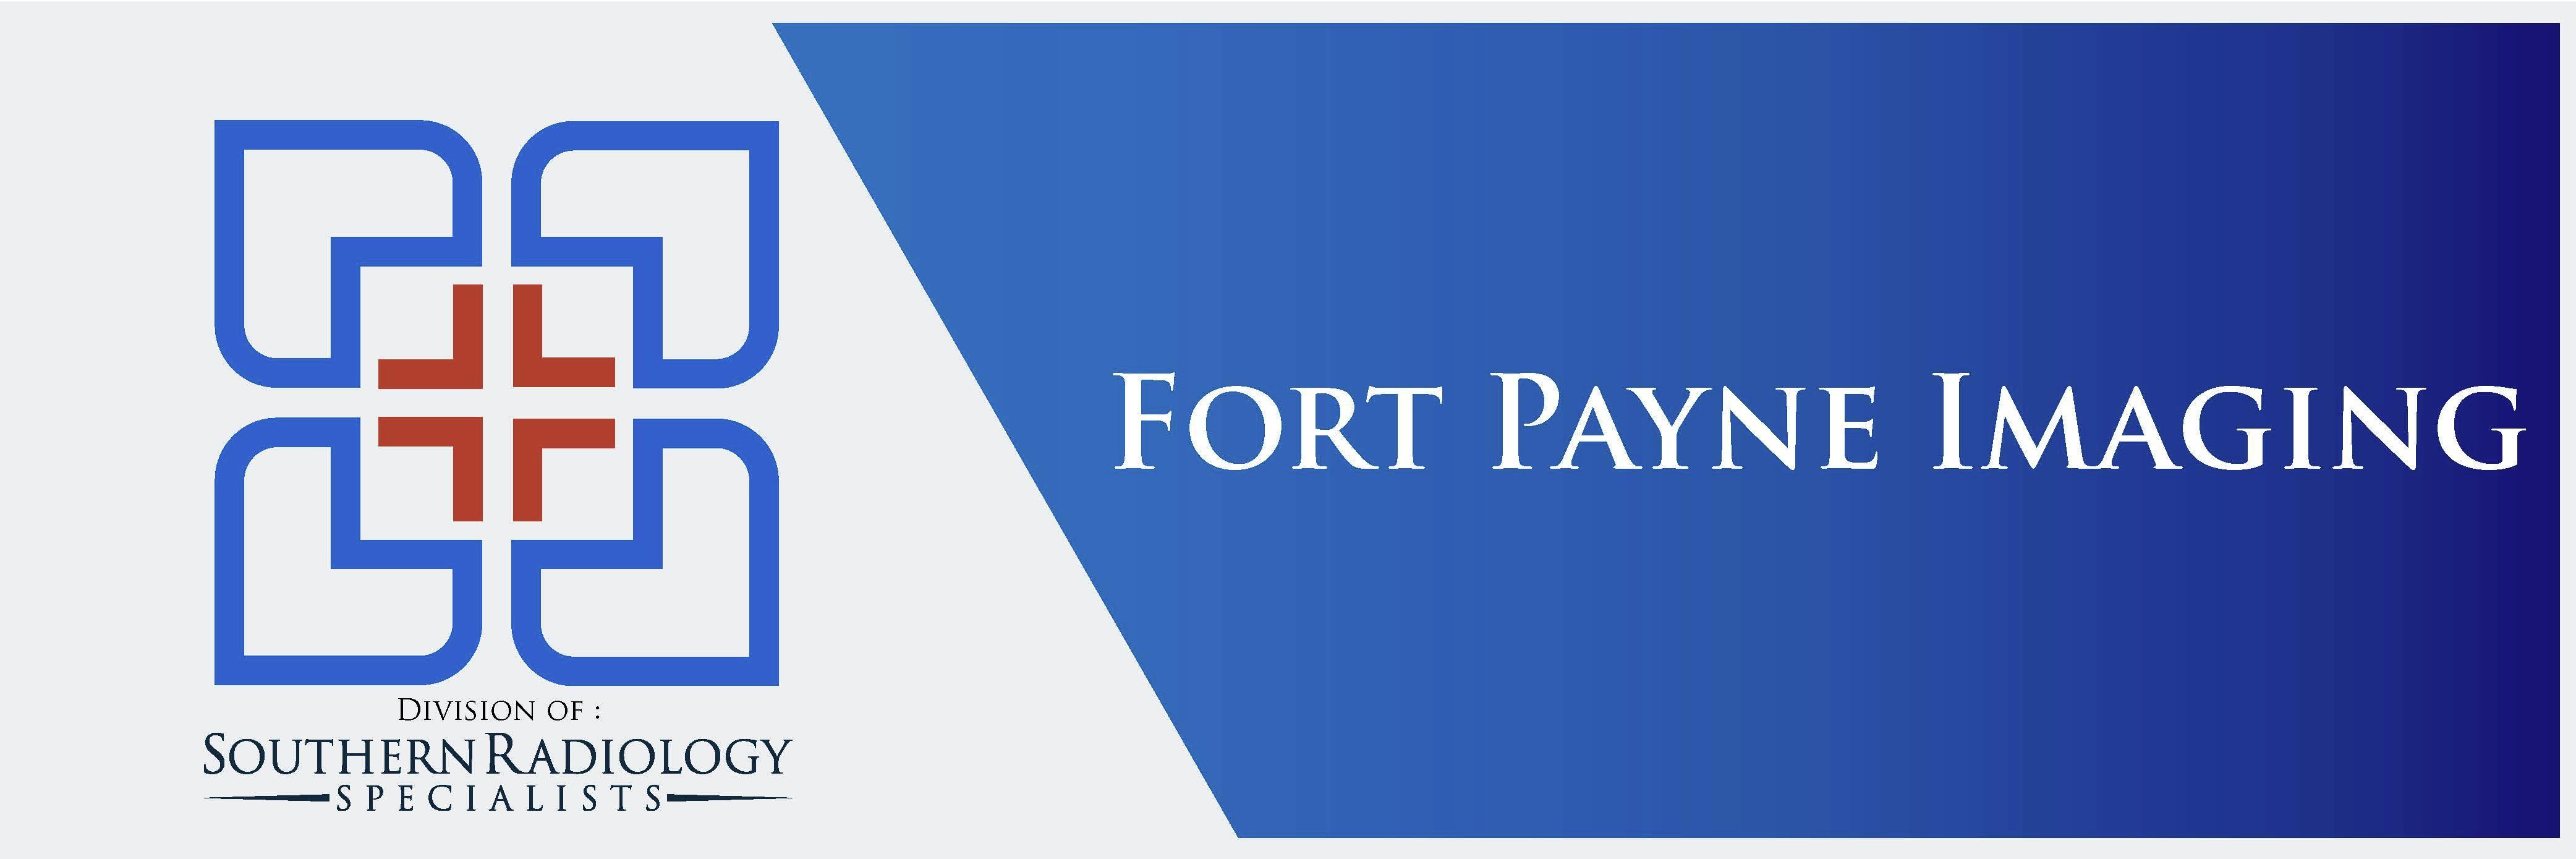 Fort Payne Imaging image 0